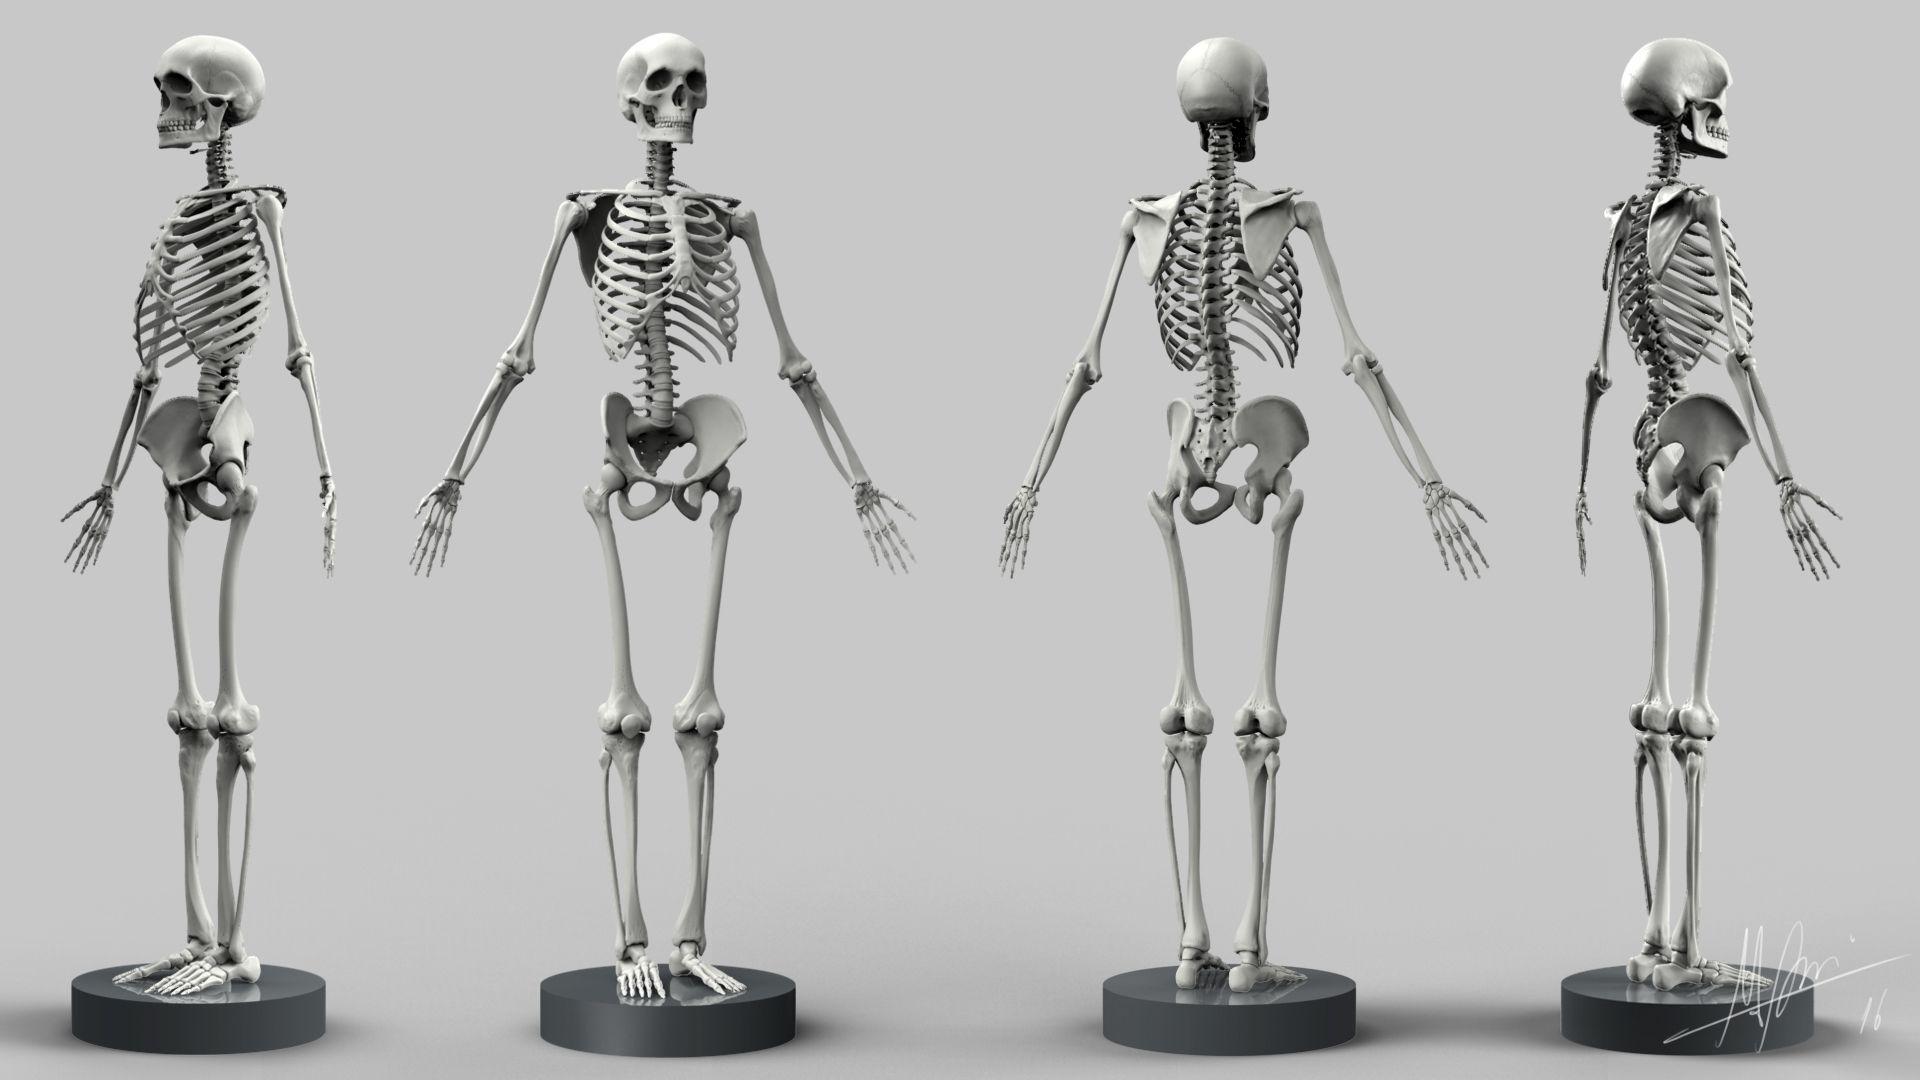 12 besten Digital Sculpting Bilder auf Pinterest   Digital sculpting ...